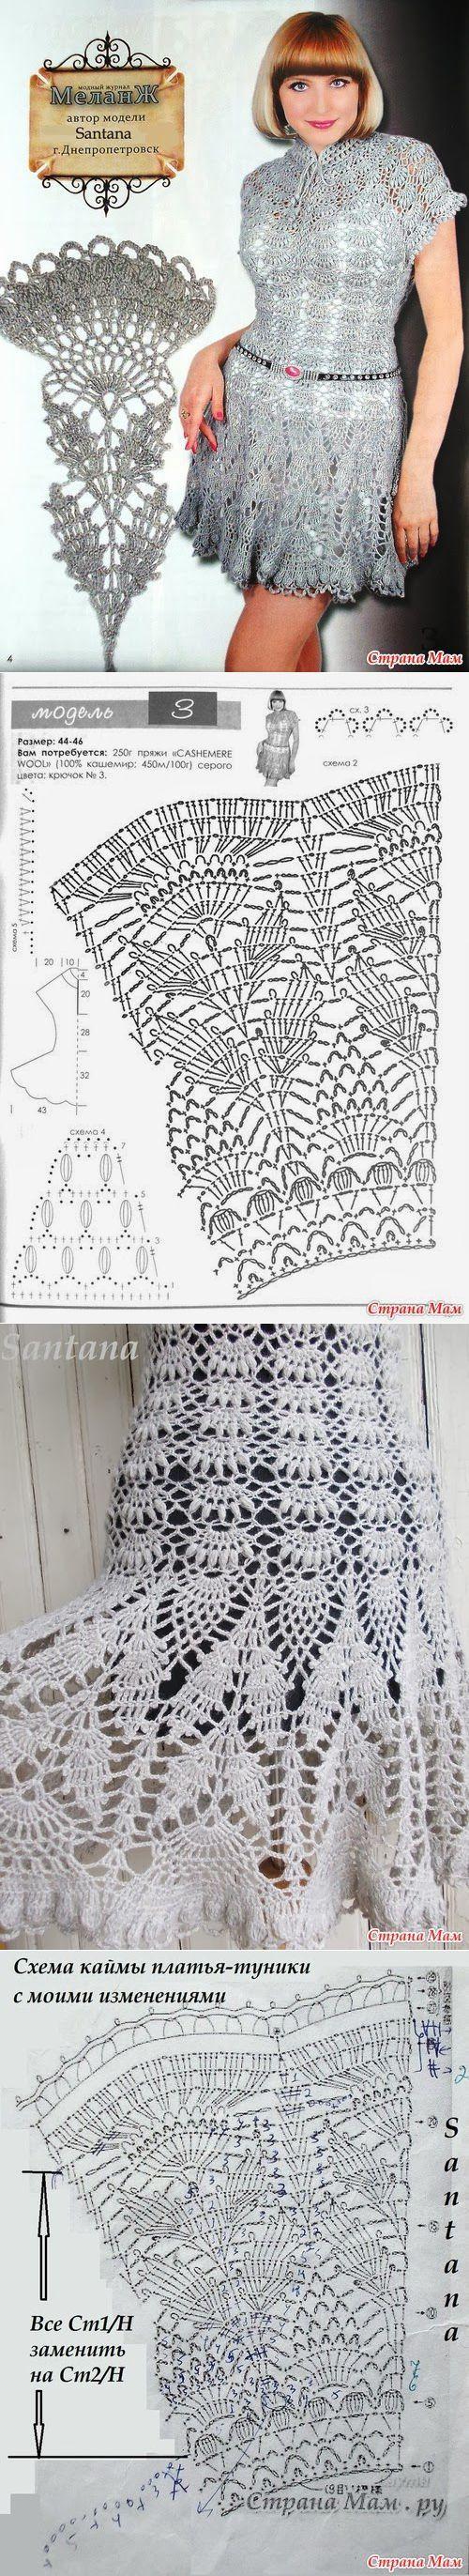 94 best patterns images on Pinterest | Crochet patterns, Crocheting ...